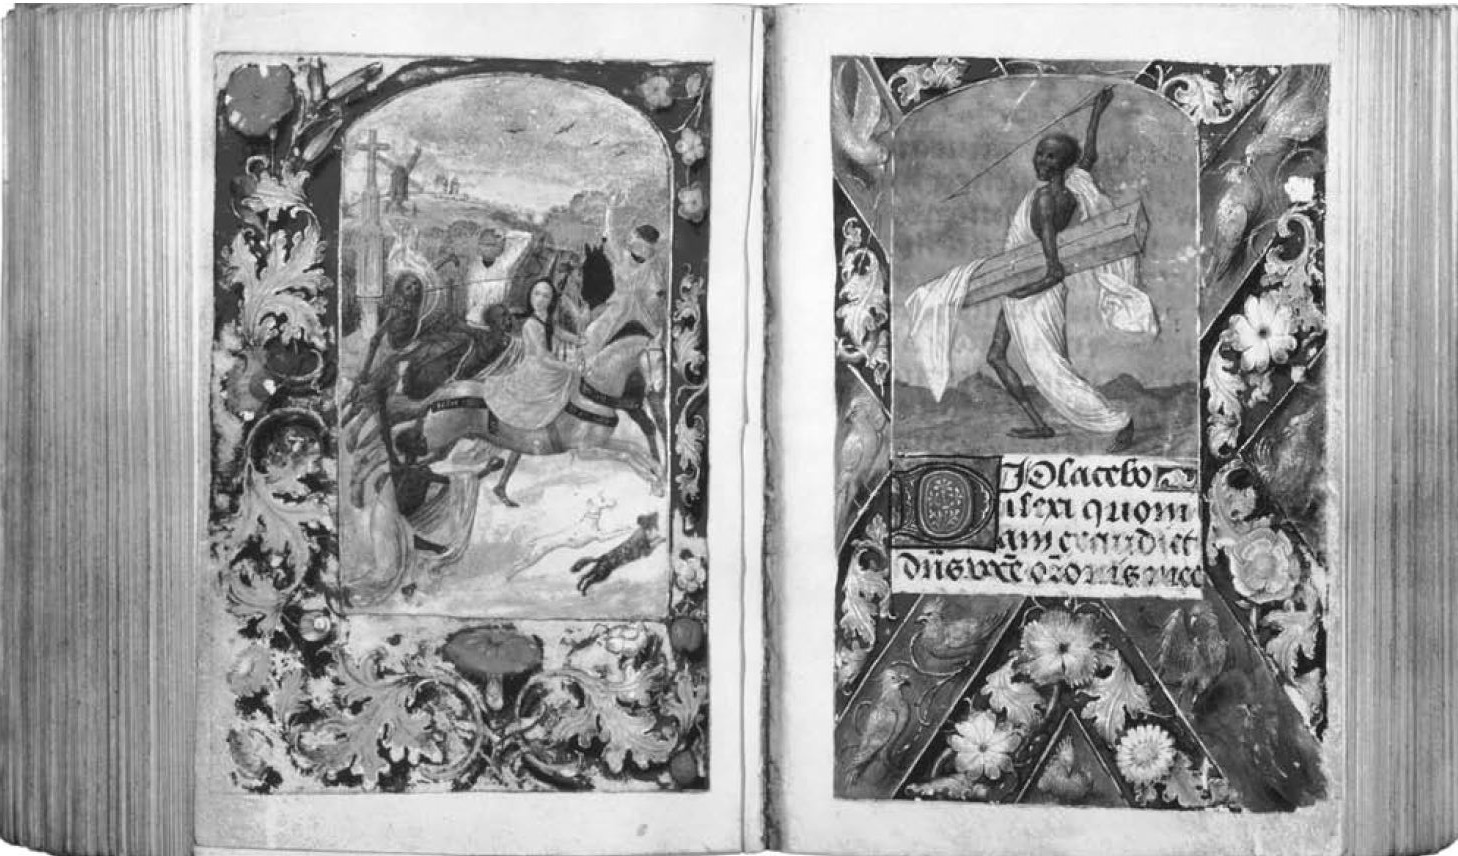 Heures de Marie de Bourgogne et Maximilien I, Berlin Kupferstichkabinett, vers 1482, SMPK MS 78B12, fol 220v-221r